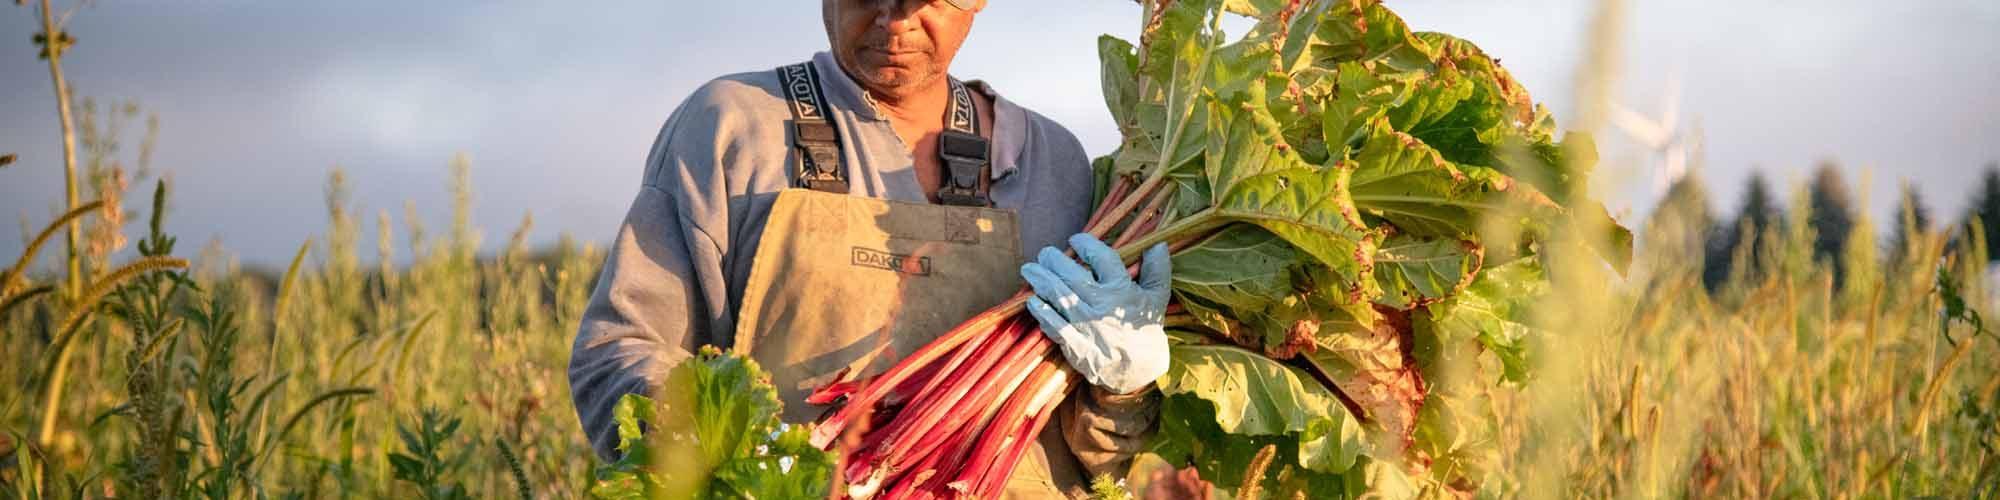 Fragile Harvest Documenting Family Farm Pandemic Paul Bettings rhubarb